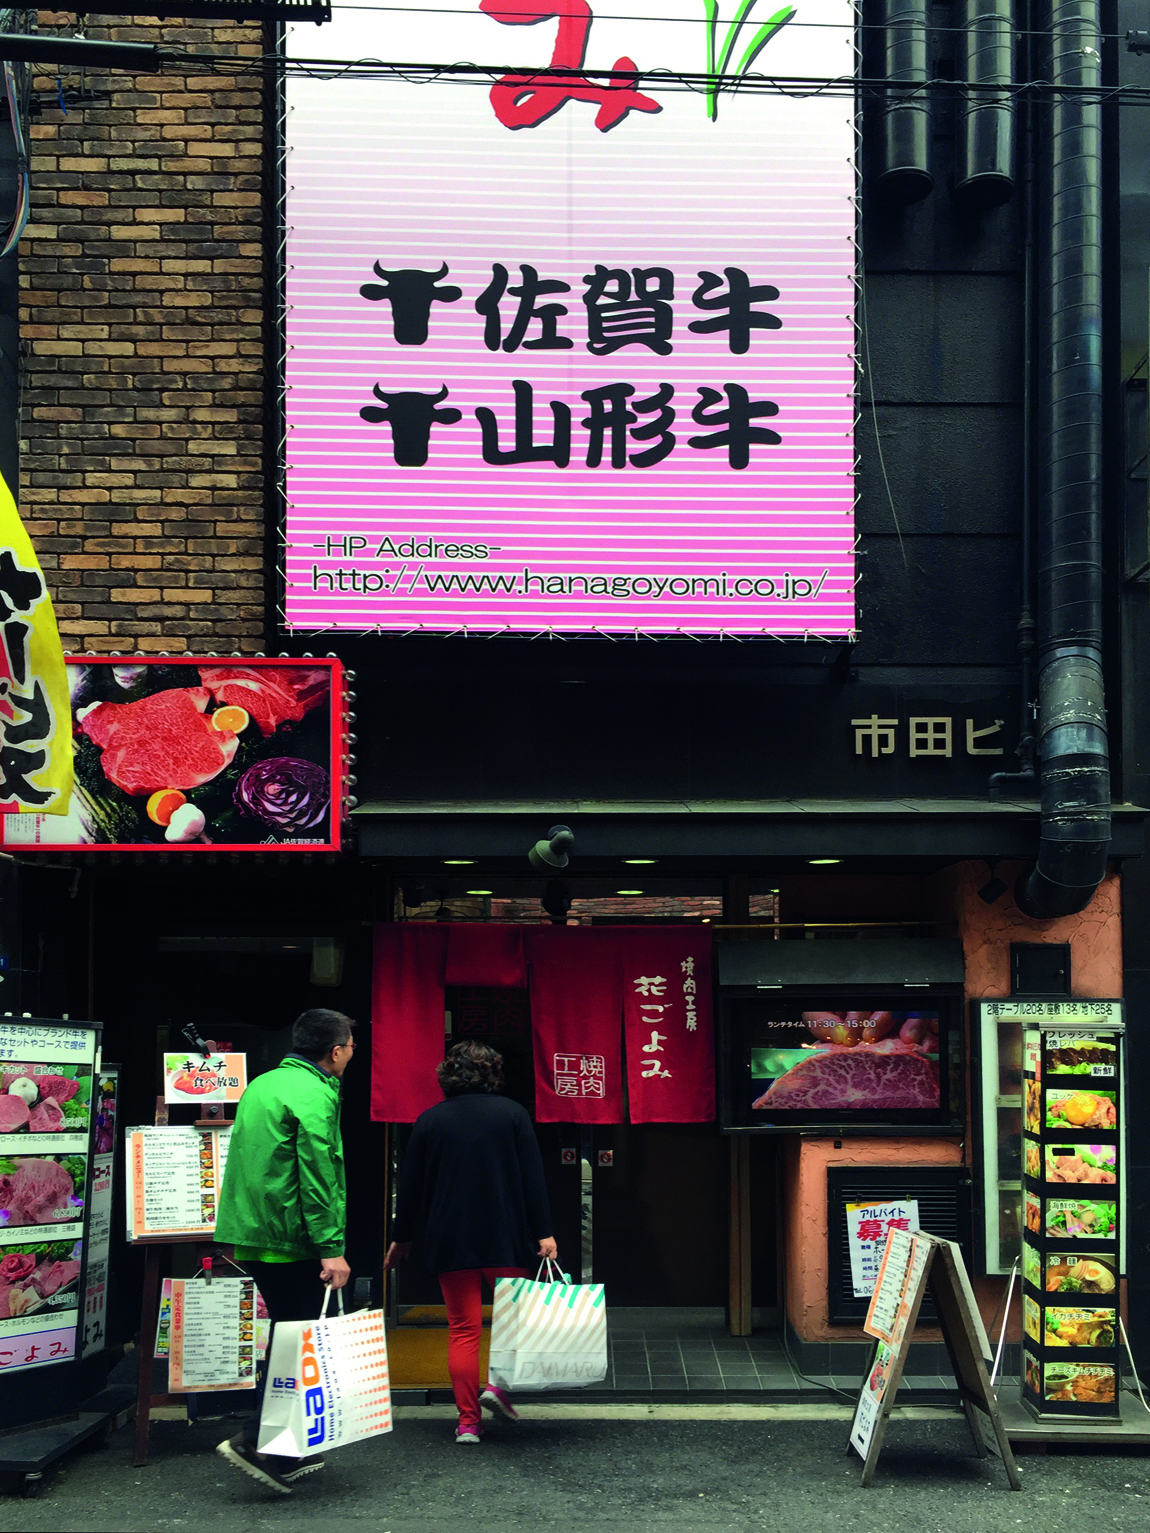 Image 6 Photo / Noren mimicry, Shinsaibashi, Osaka, Photograph by CC Williams